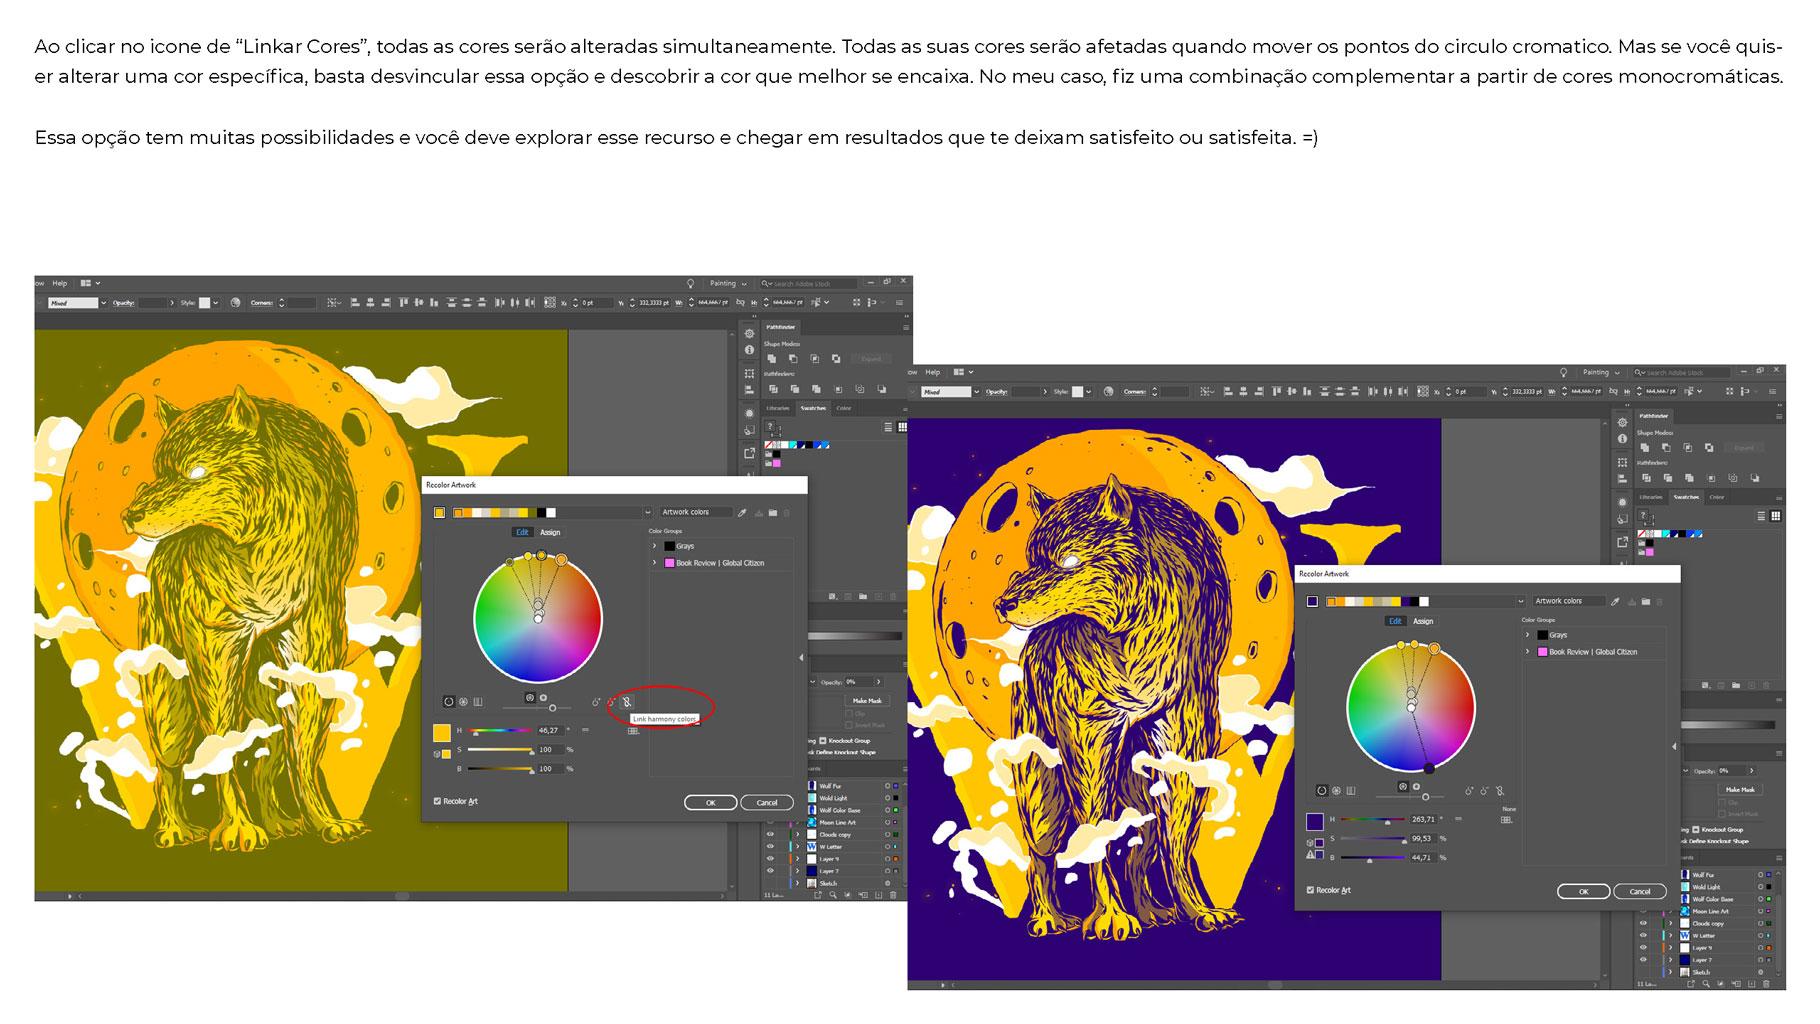 [淘宝购买] 300款色彩亮丽蒸汽波风动画绘画色板色轮模板素材 300 Color Swatches For Adobe Illustrator & Adobe Photoshop插图(32)